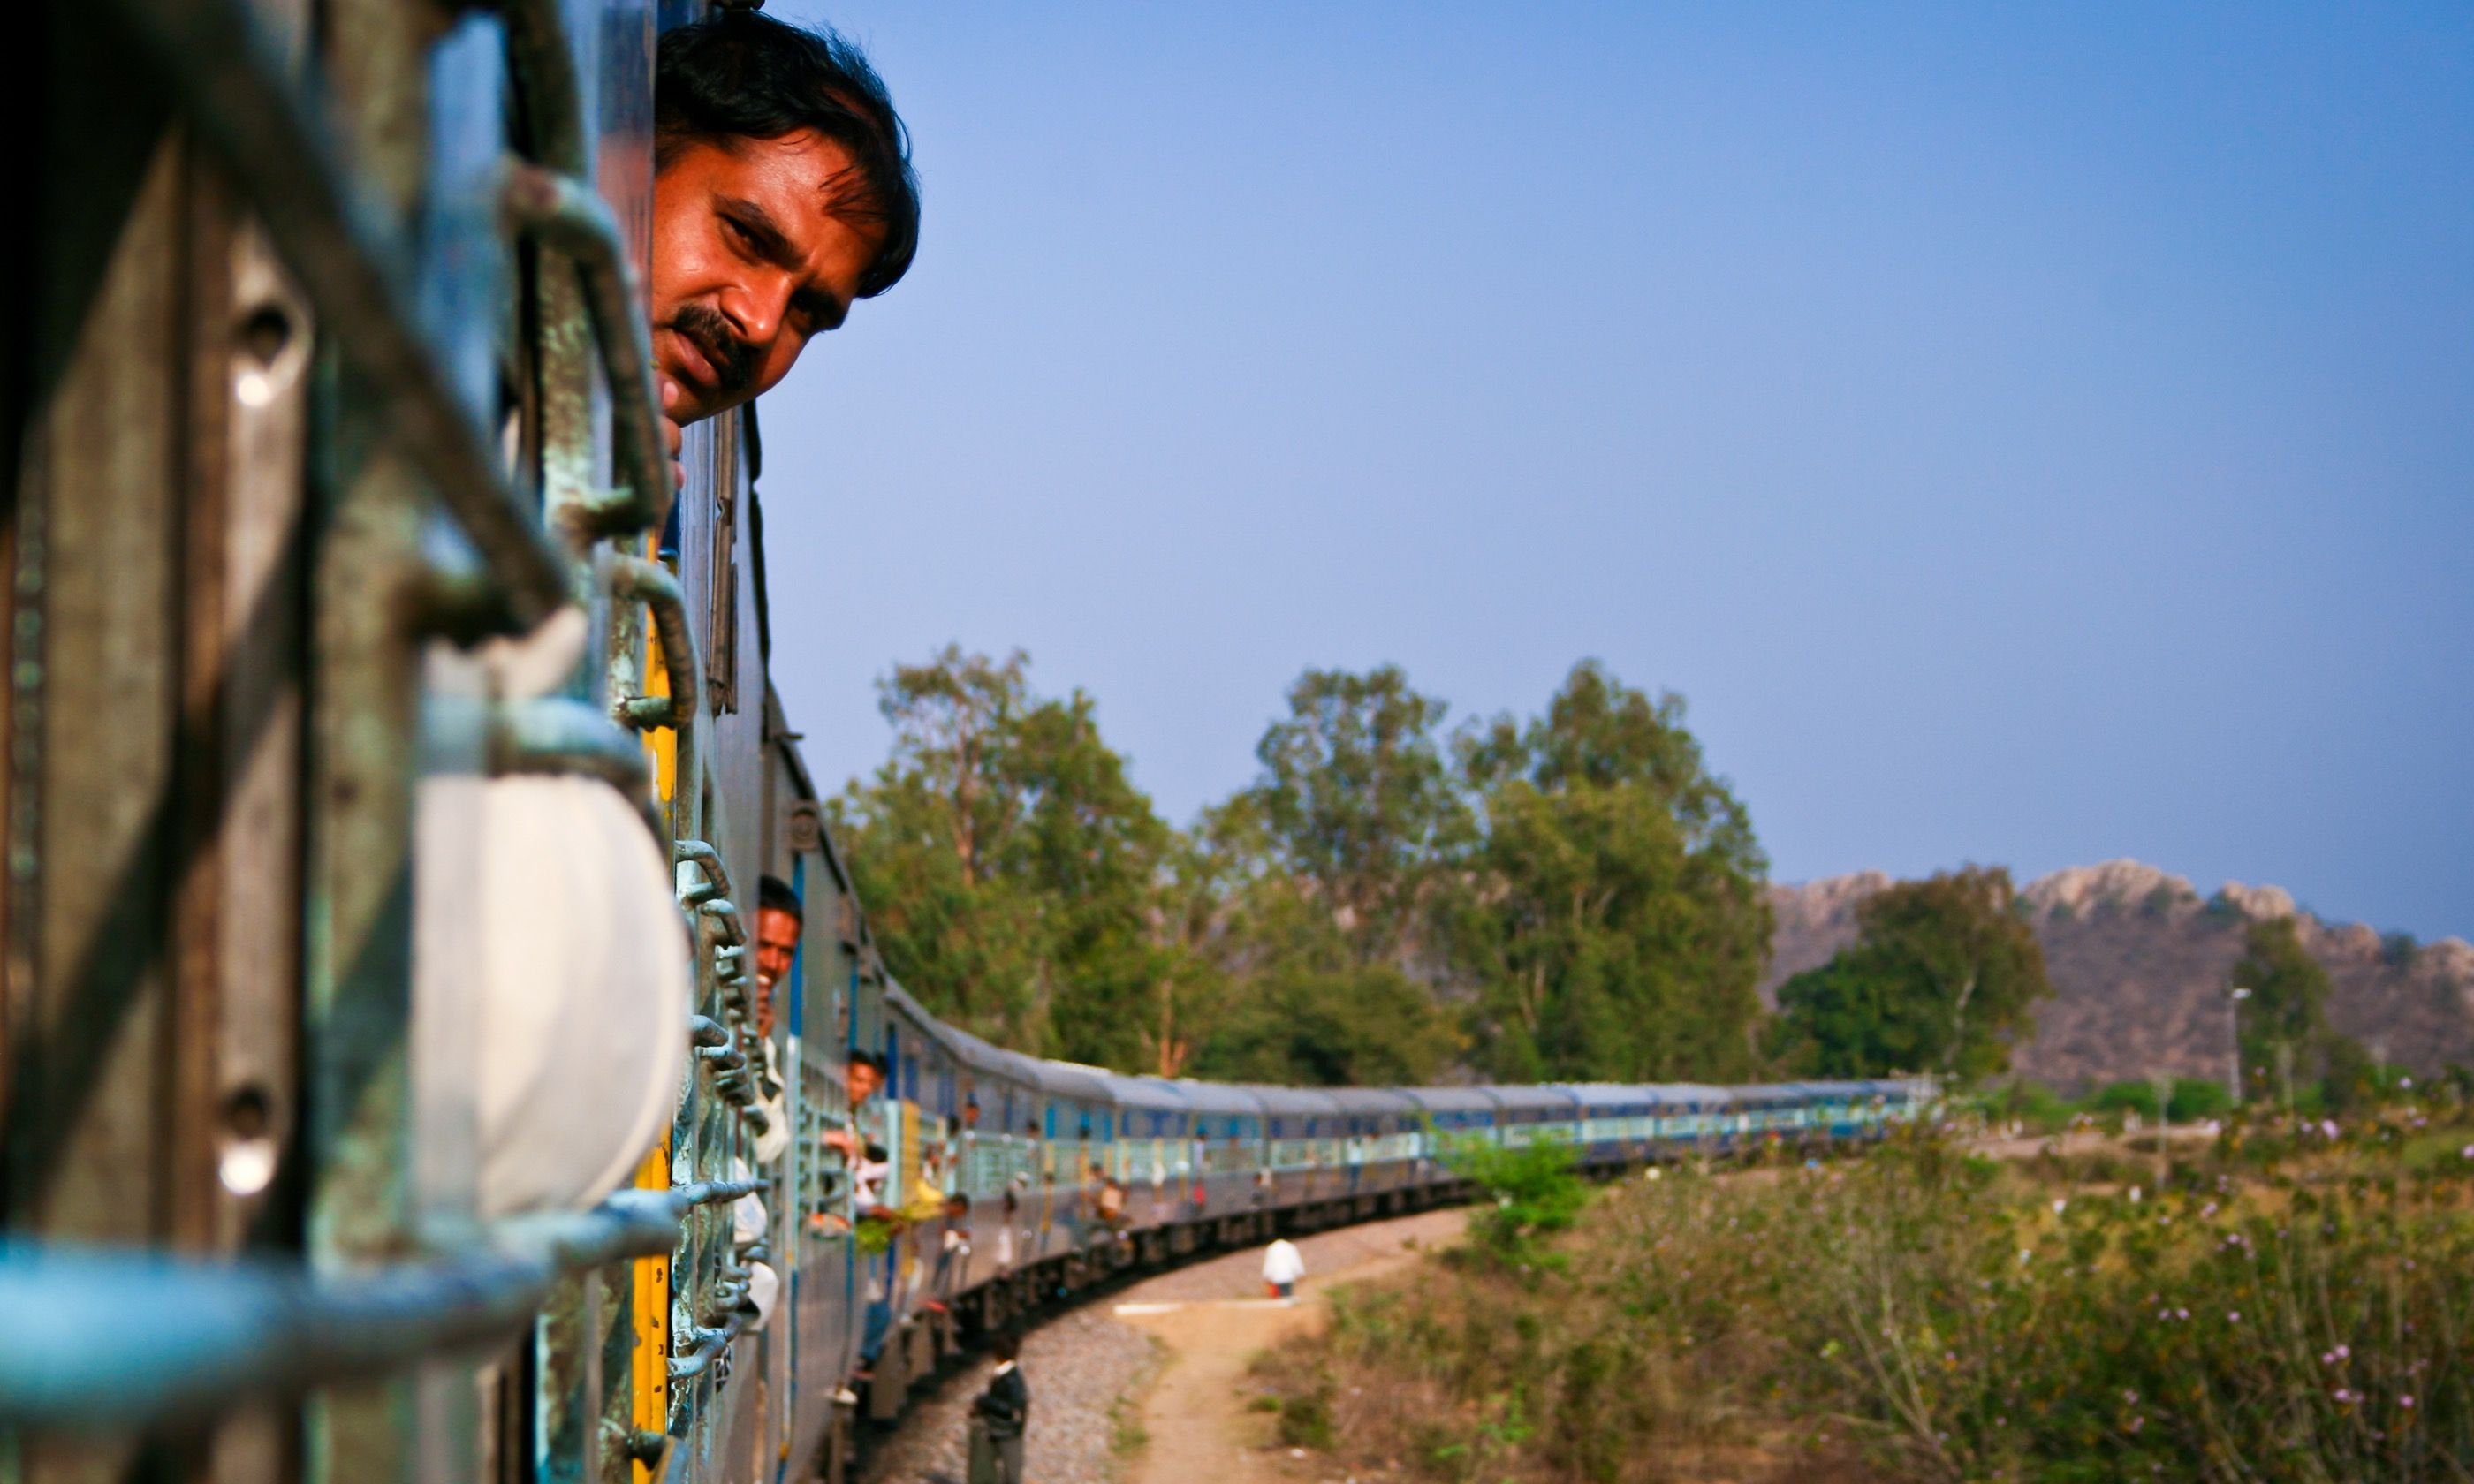 Train to Jhansi (Shutterstock.com)